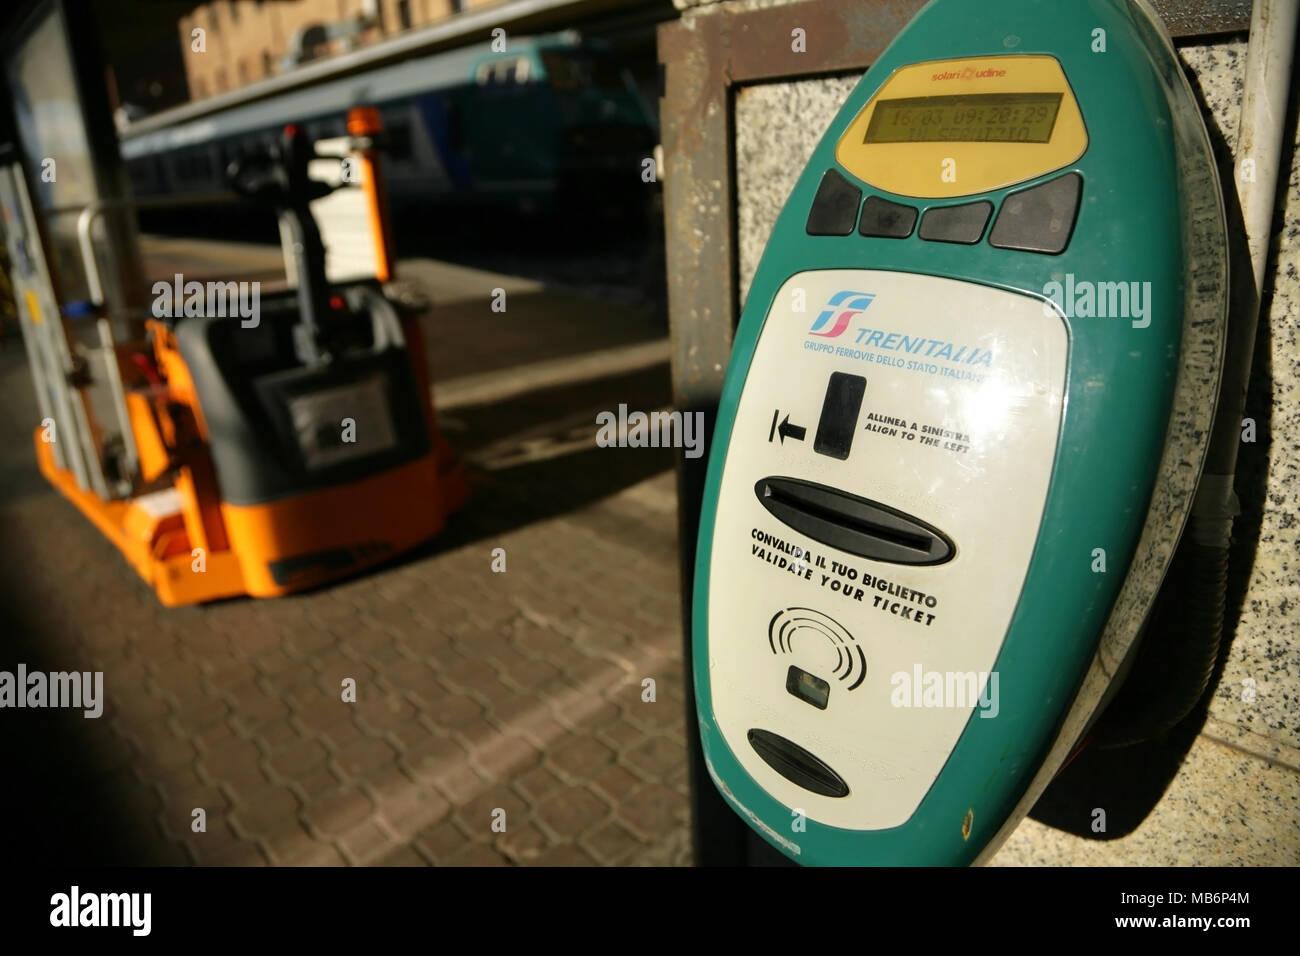 Italian railways ticket validation machine. - Stock Image